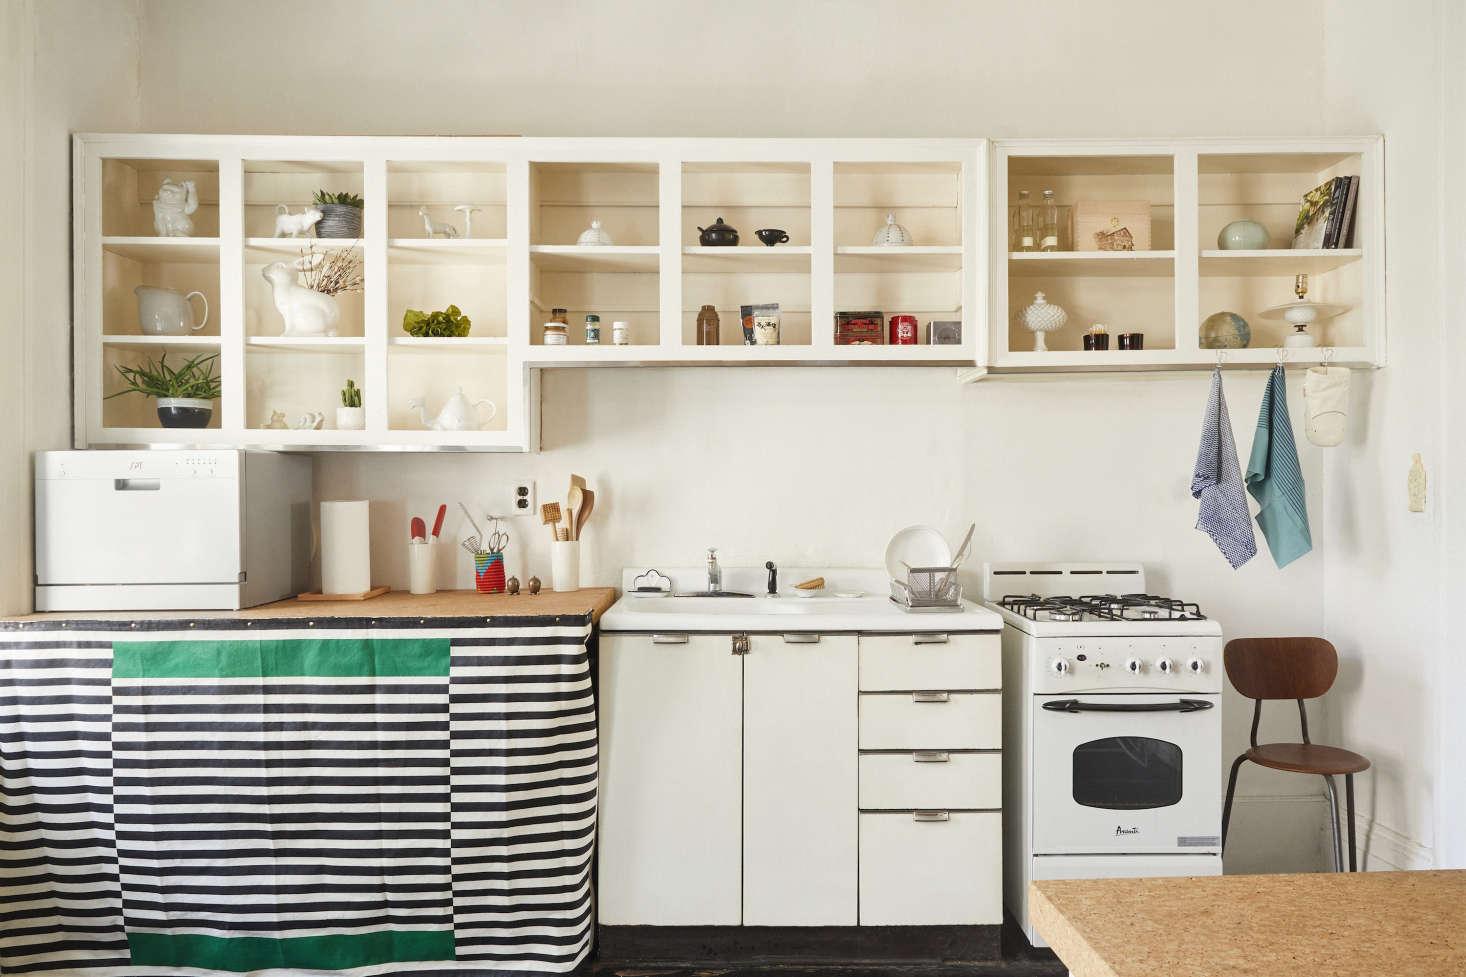 Expert Advice 23 Genius Reversible Budget Friendly Hacks To Transform A Rental Apartment Remodelista